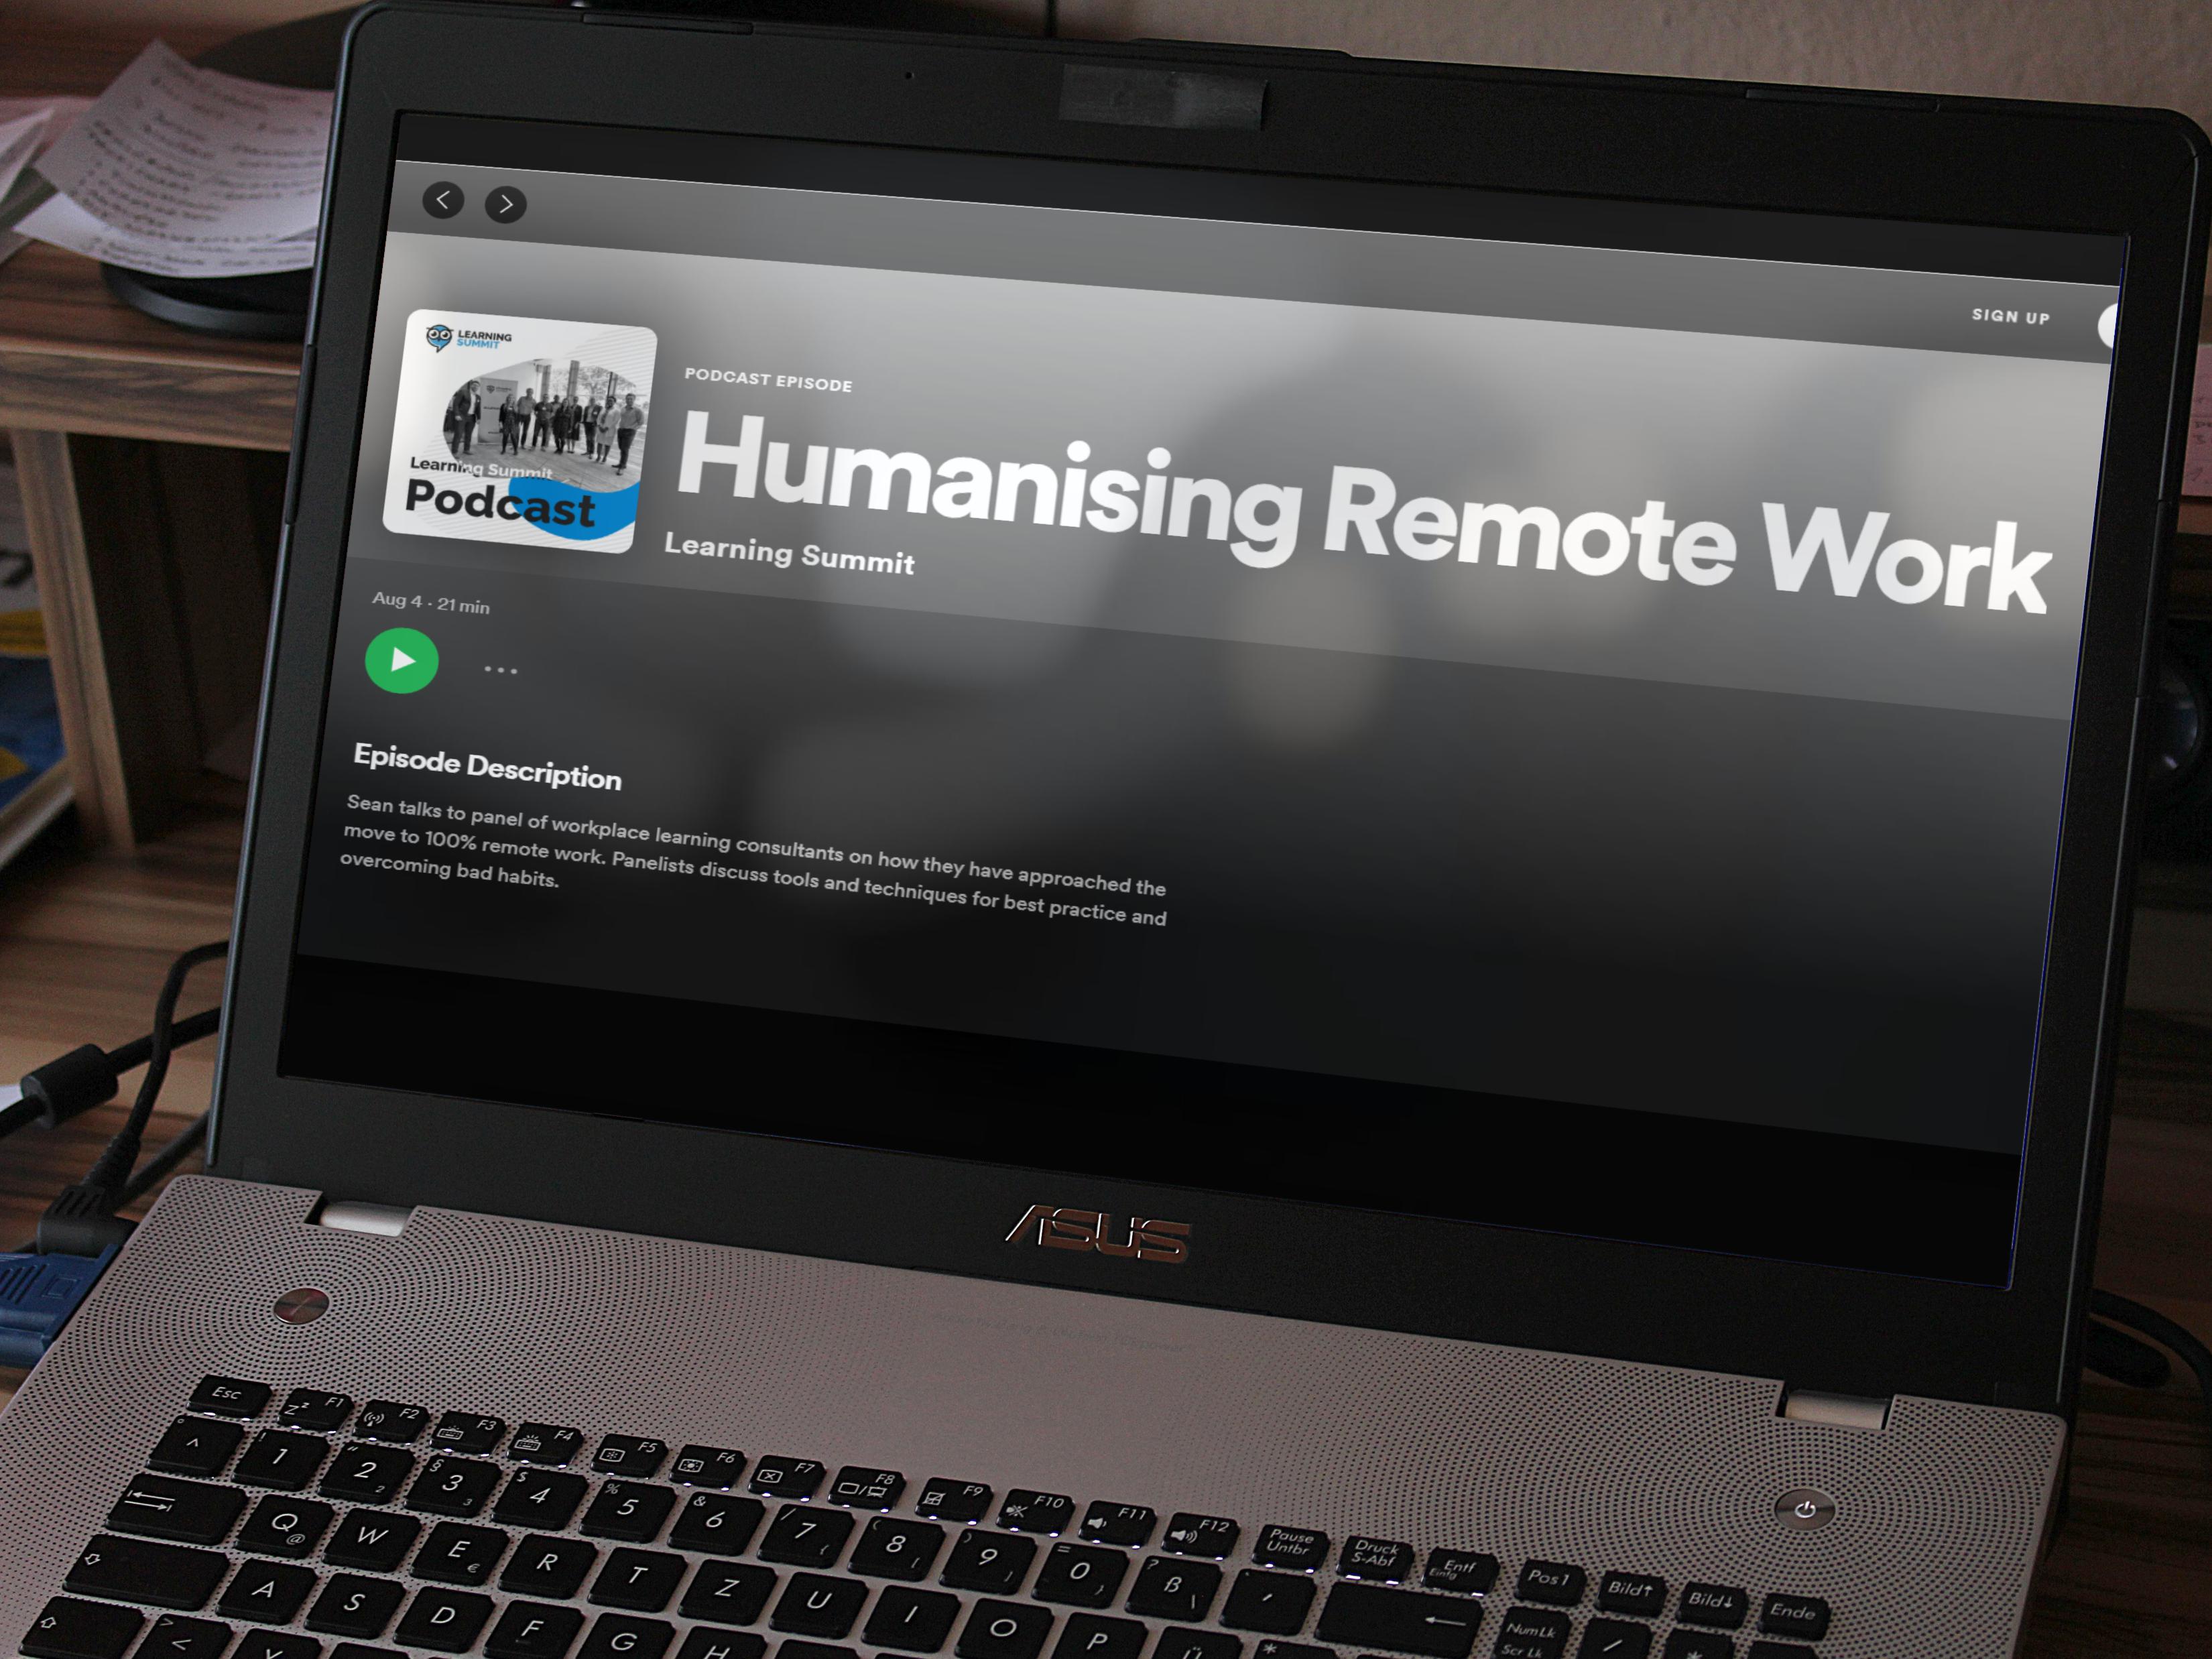 Humanising Remote Work